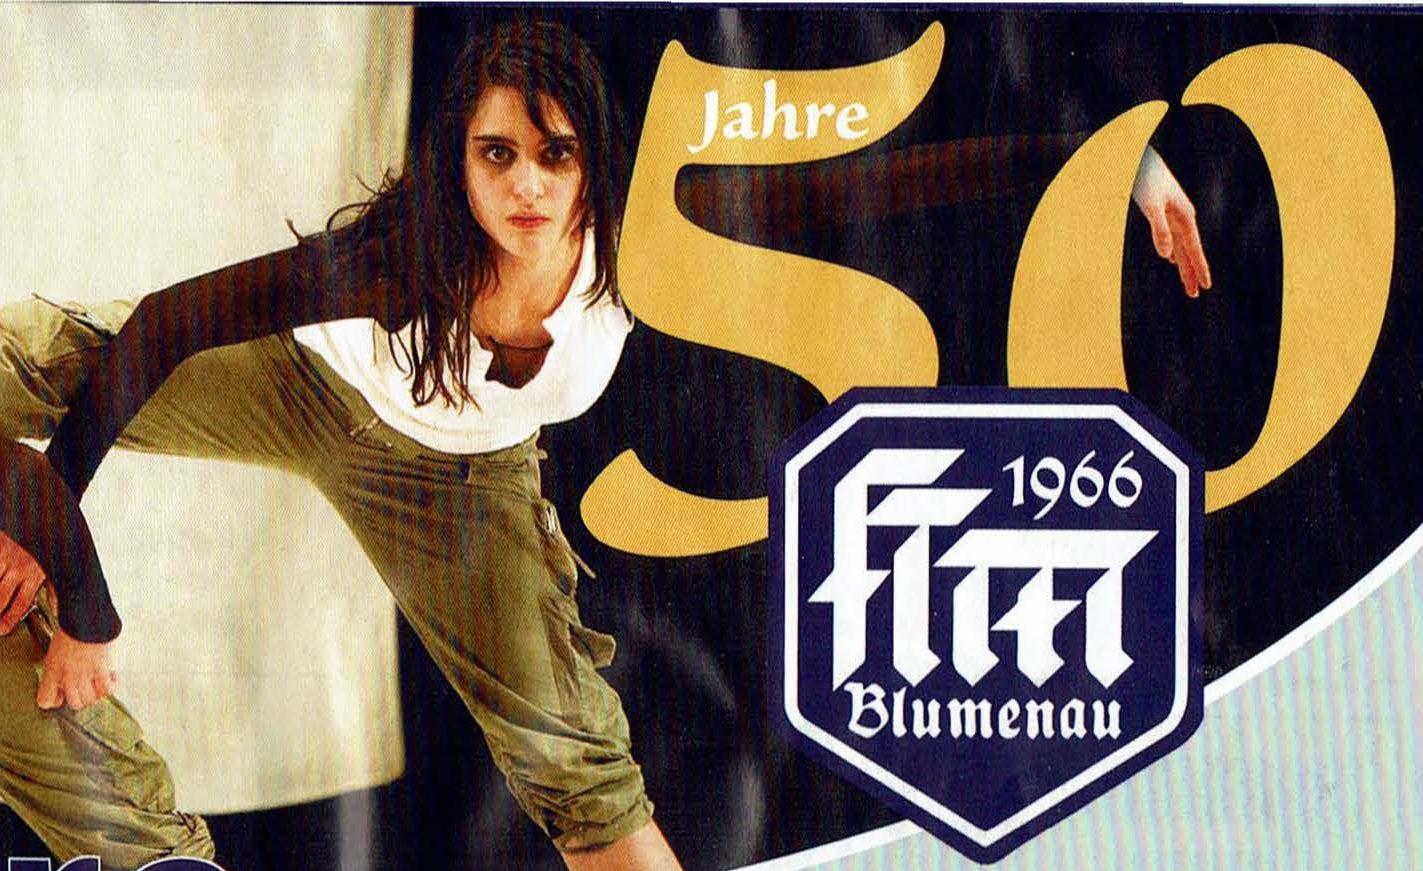 50 Jahre FTM Blumenau